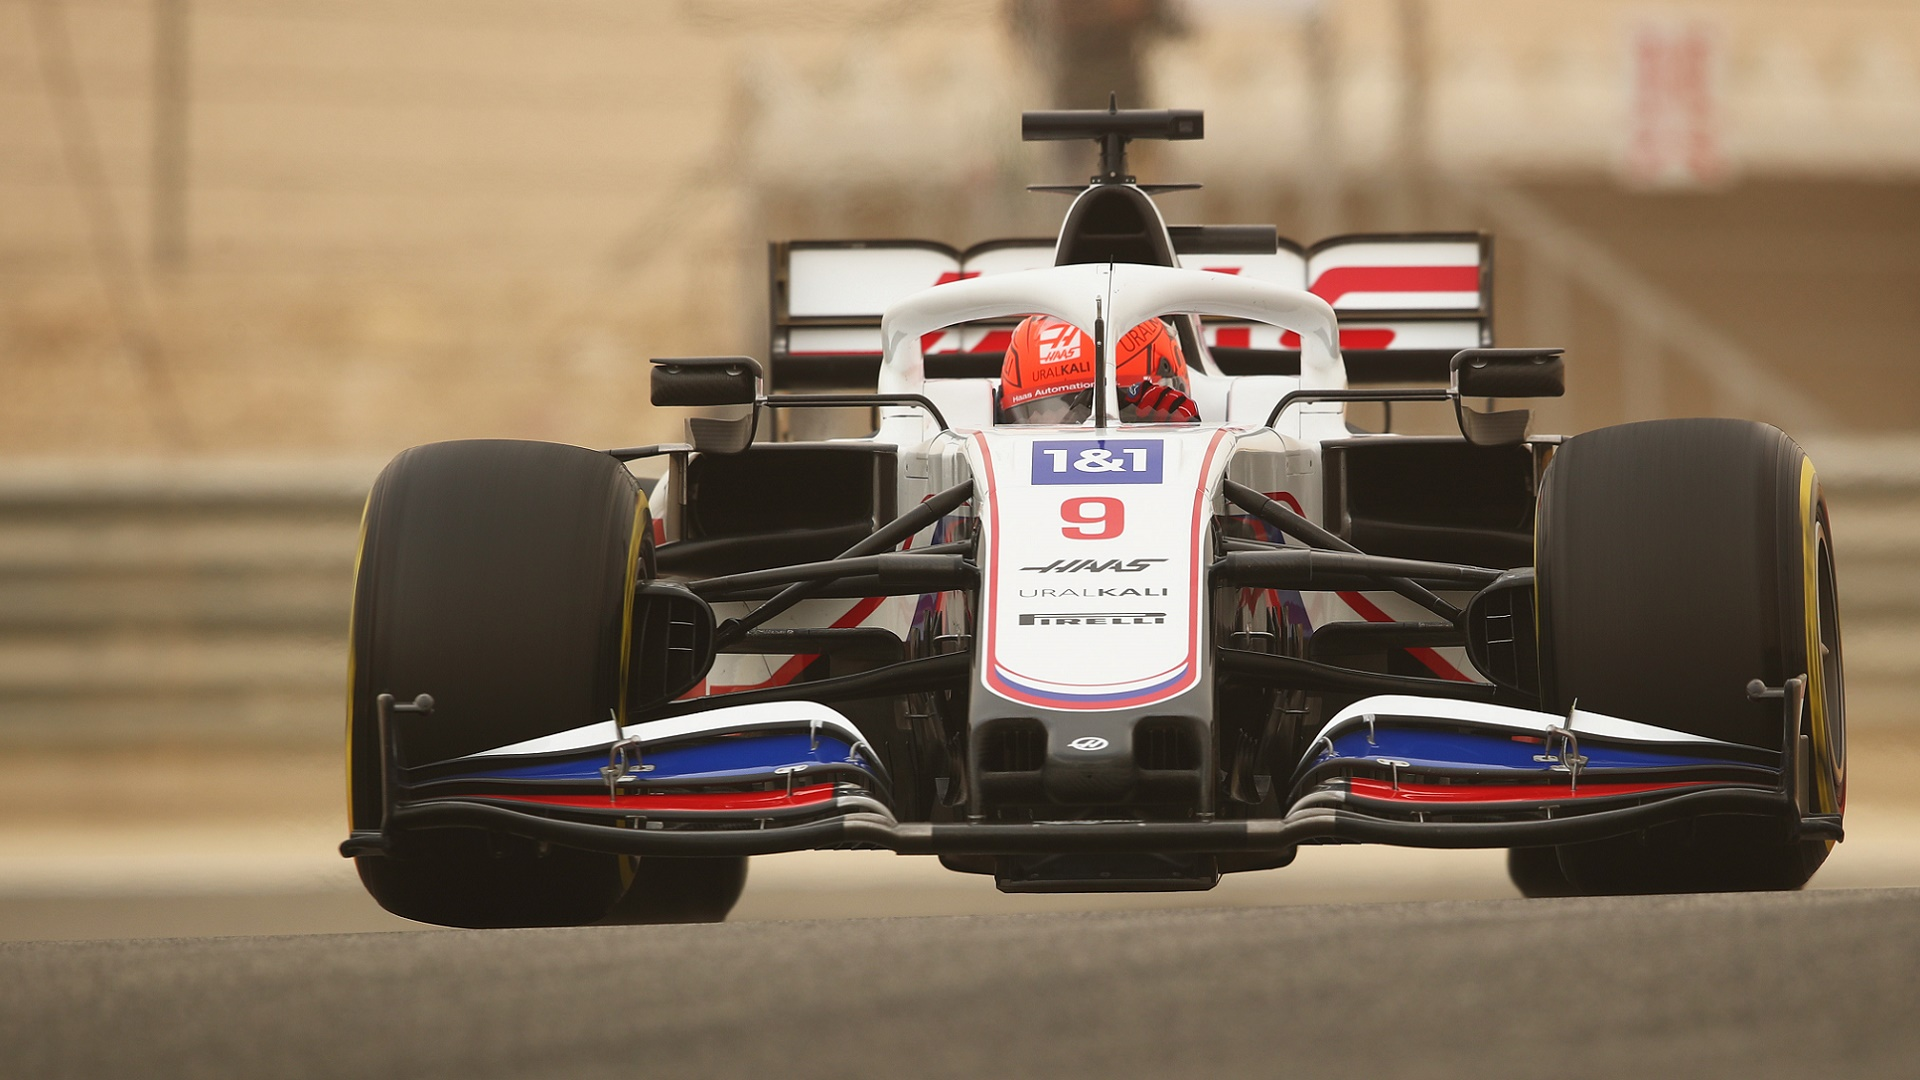 2021-03-12 Mazepin Haas F1 Formula 1